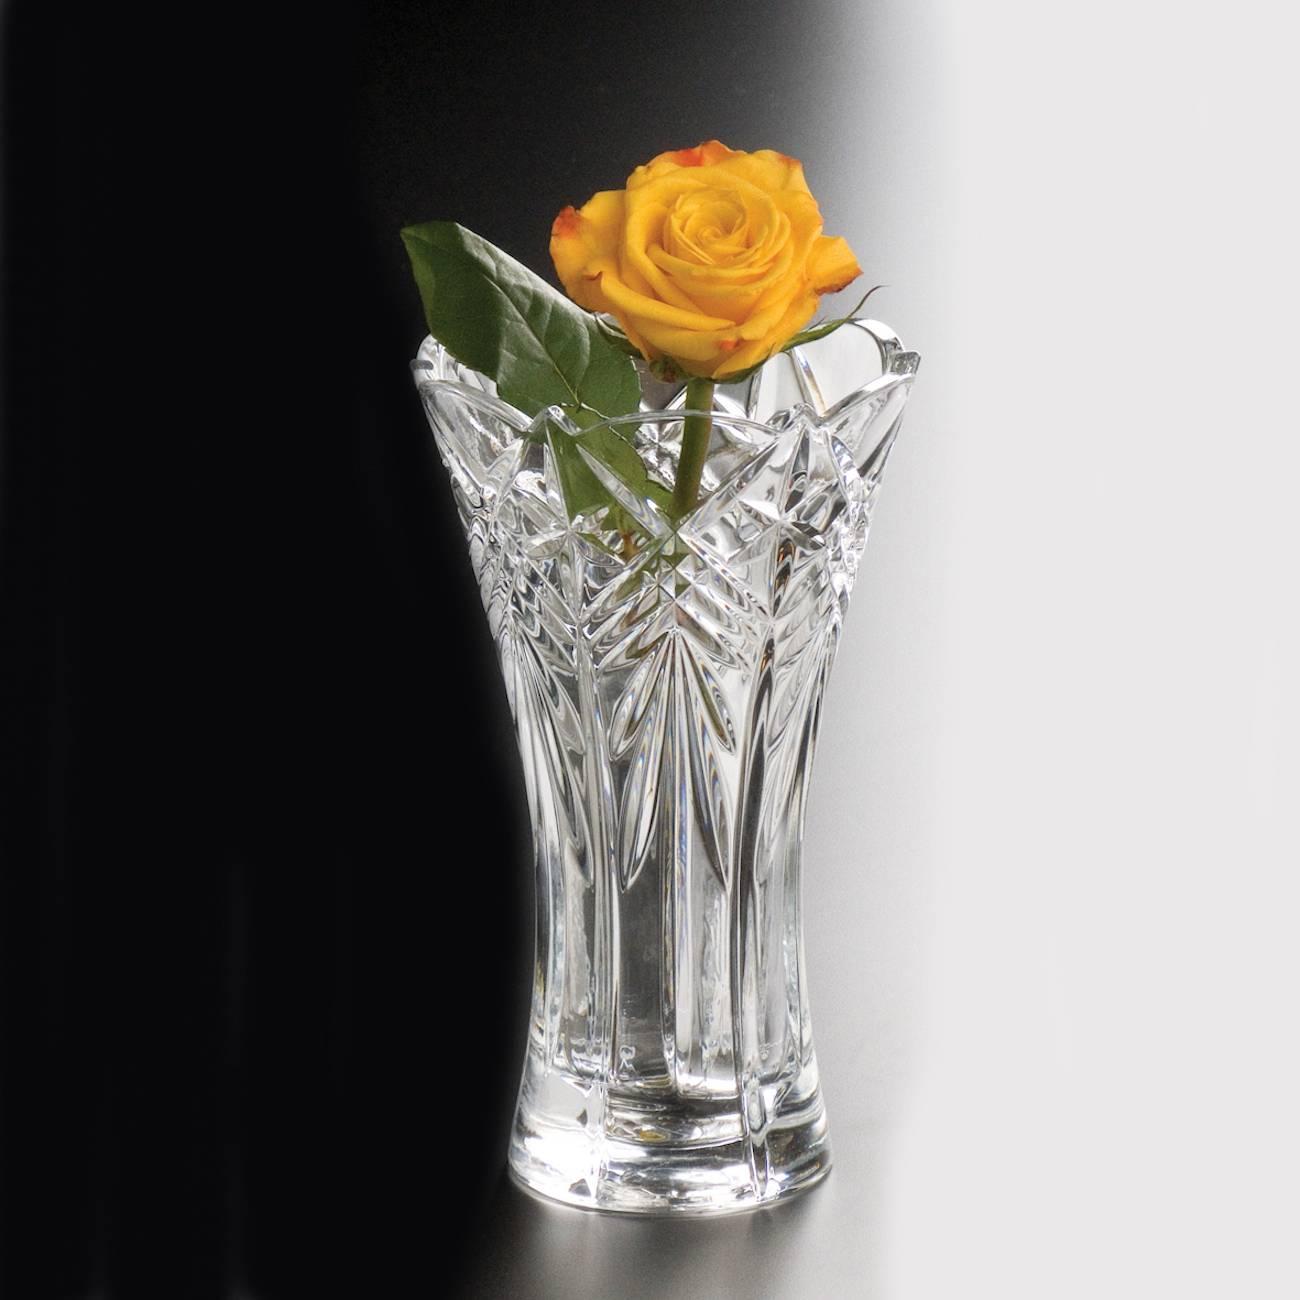 Vaso Taurus Acinturado em Cristal - Bohemia Crystalite - 25 cm